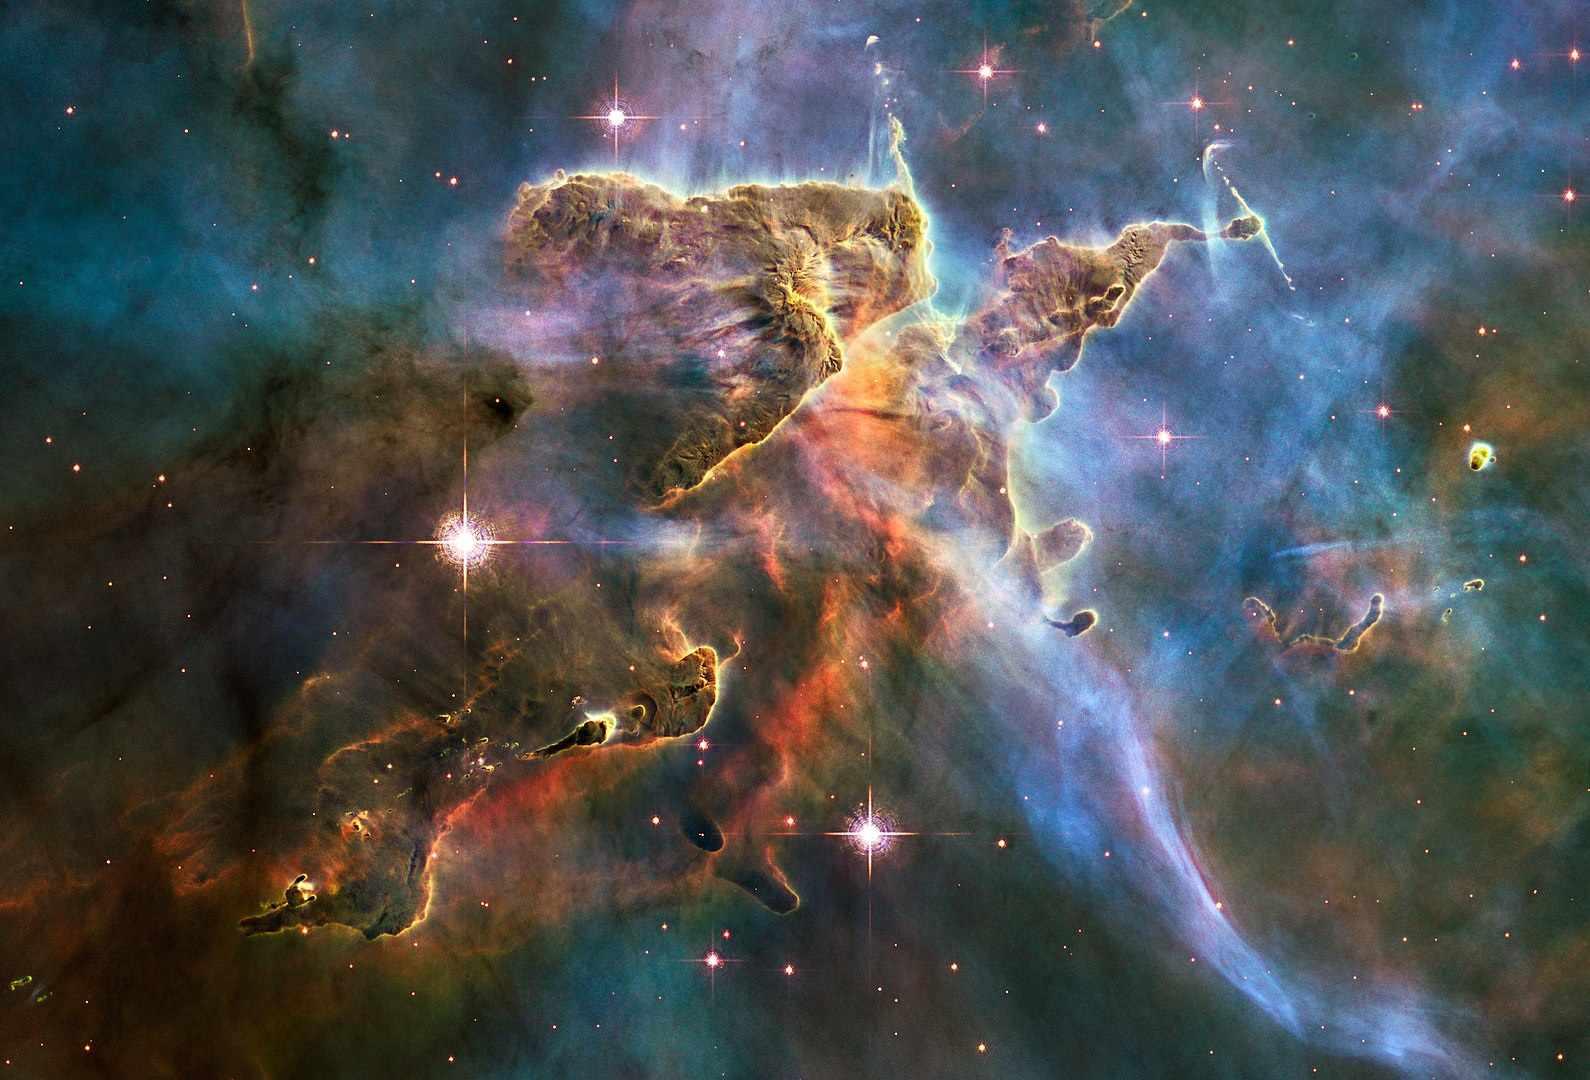 Stars in the Carina nebula.